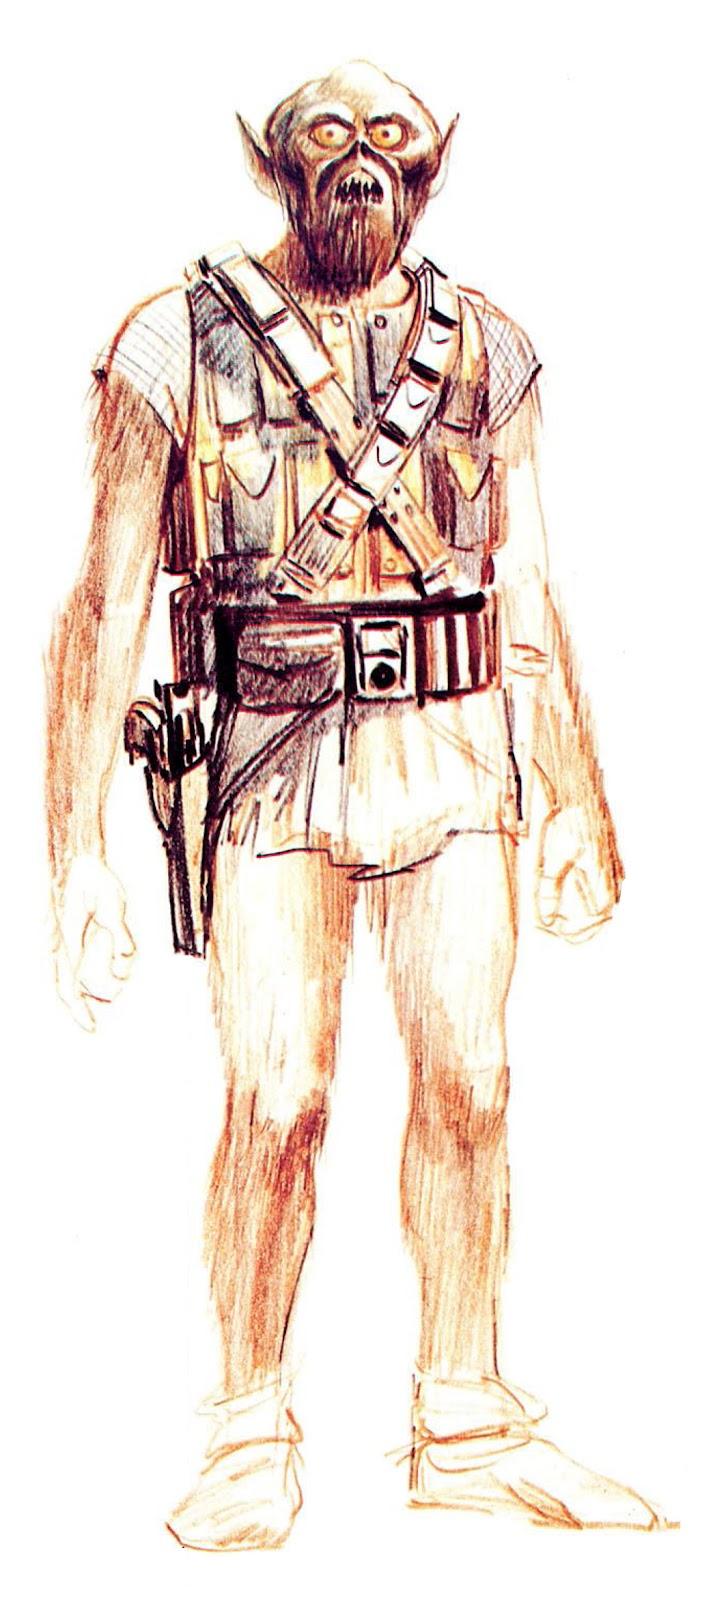 Original Chewbacca Conceptual art design